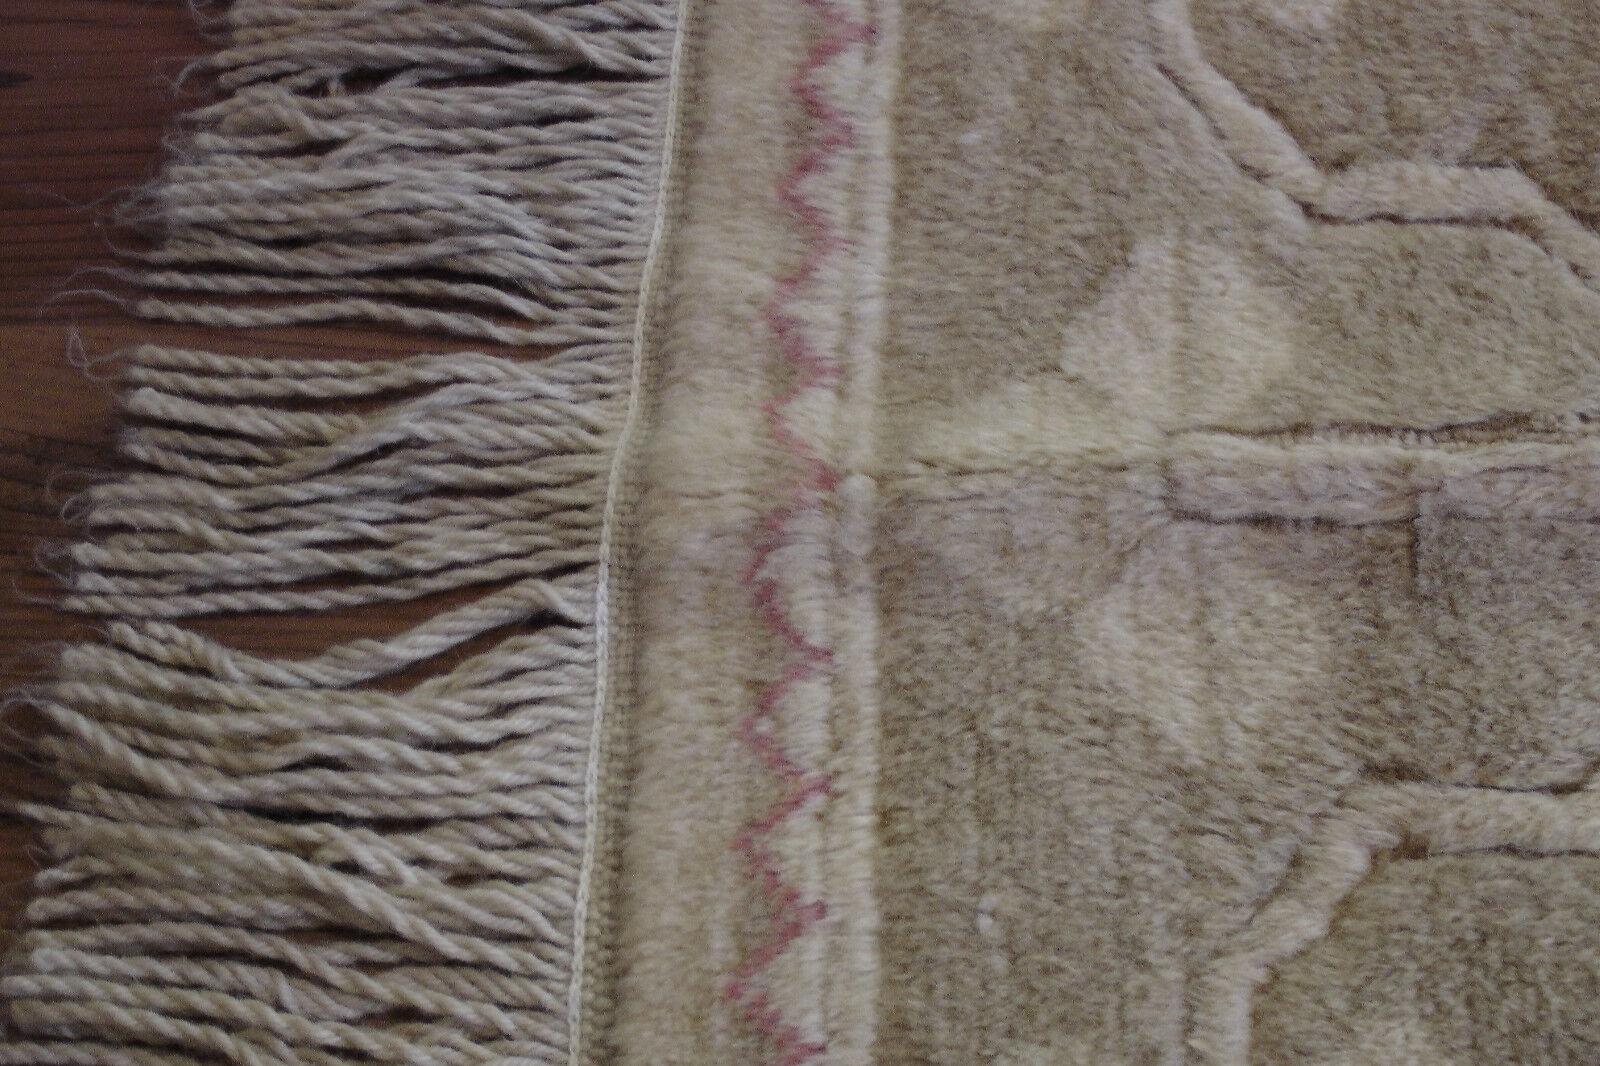 Kirman Teppich 3,18 x 1,96 m  Orientteppich Orientteppich Orientteppich 100% Wolle Handgeknüpft  NEU 94a89c